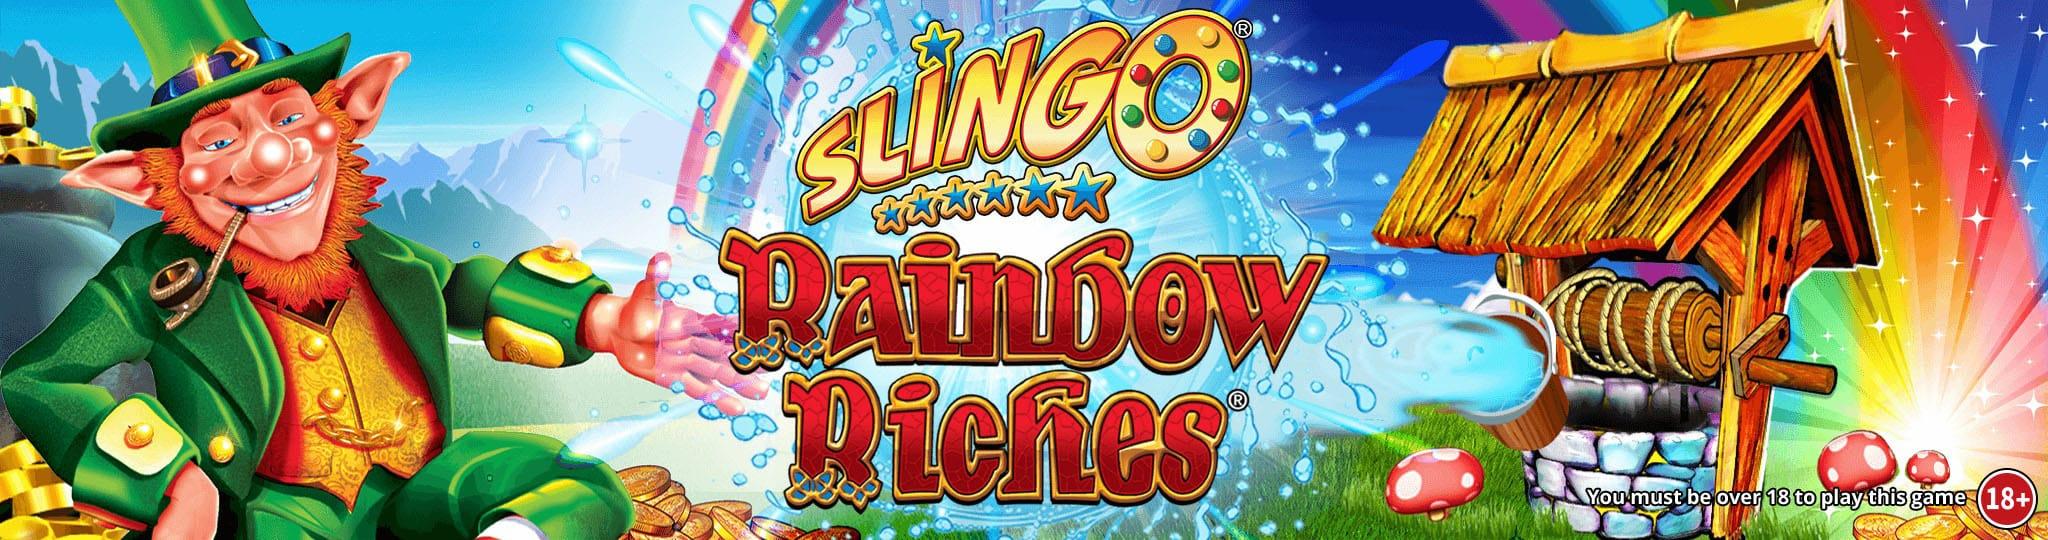 Slingo Rainbow Riches Slots Mega Reel